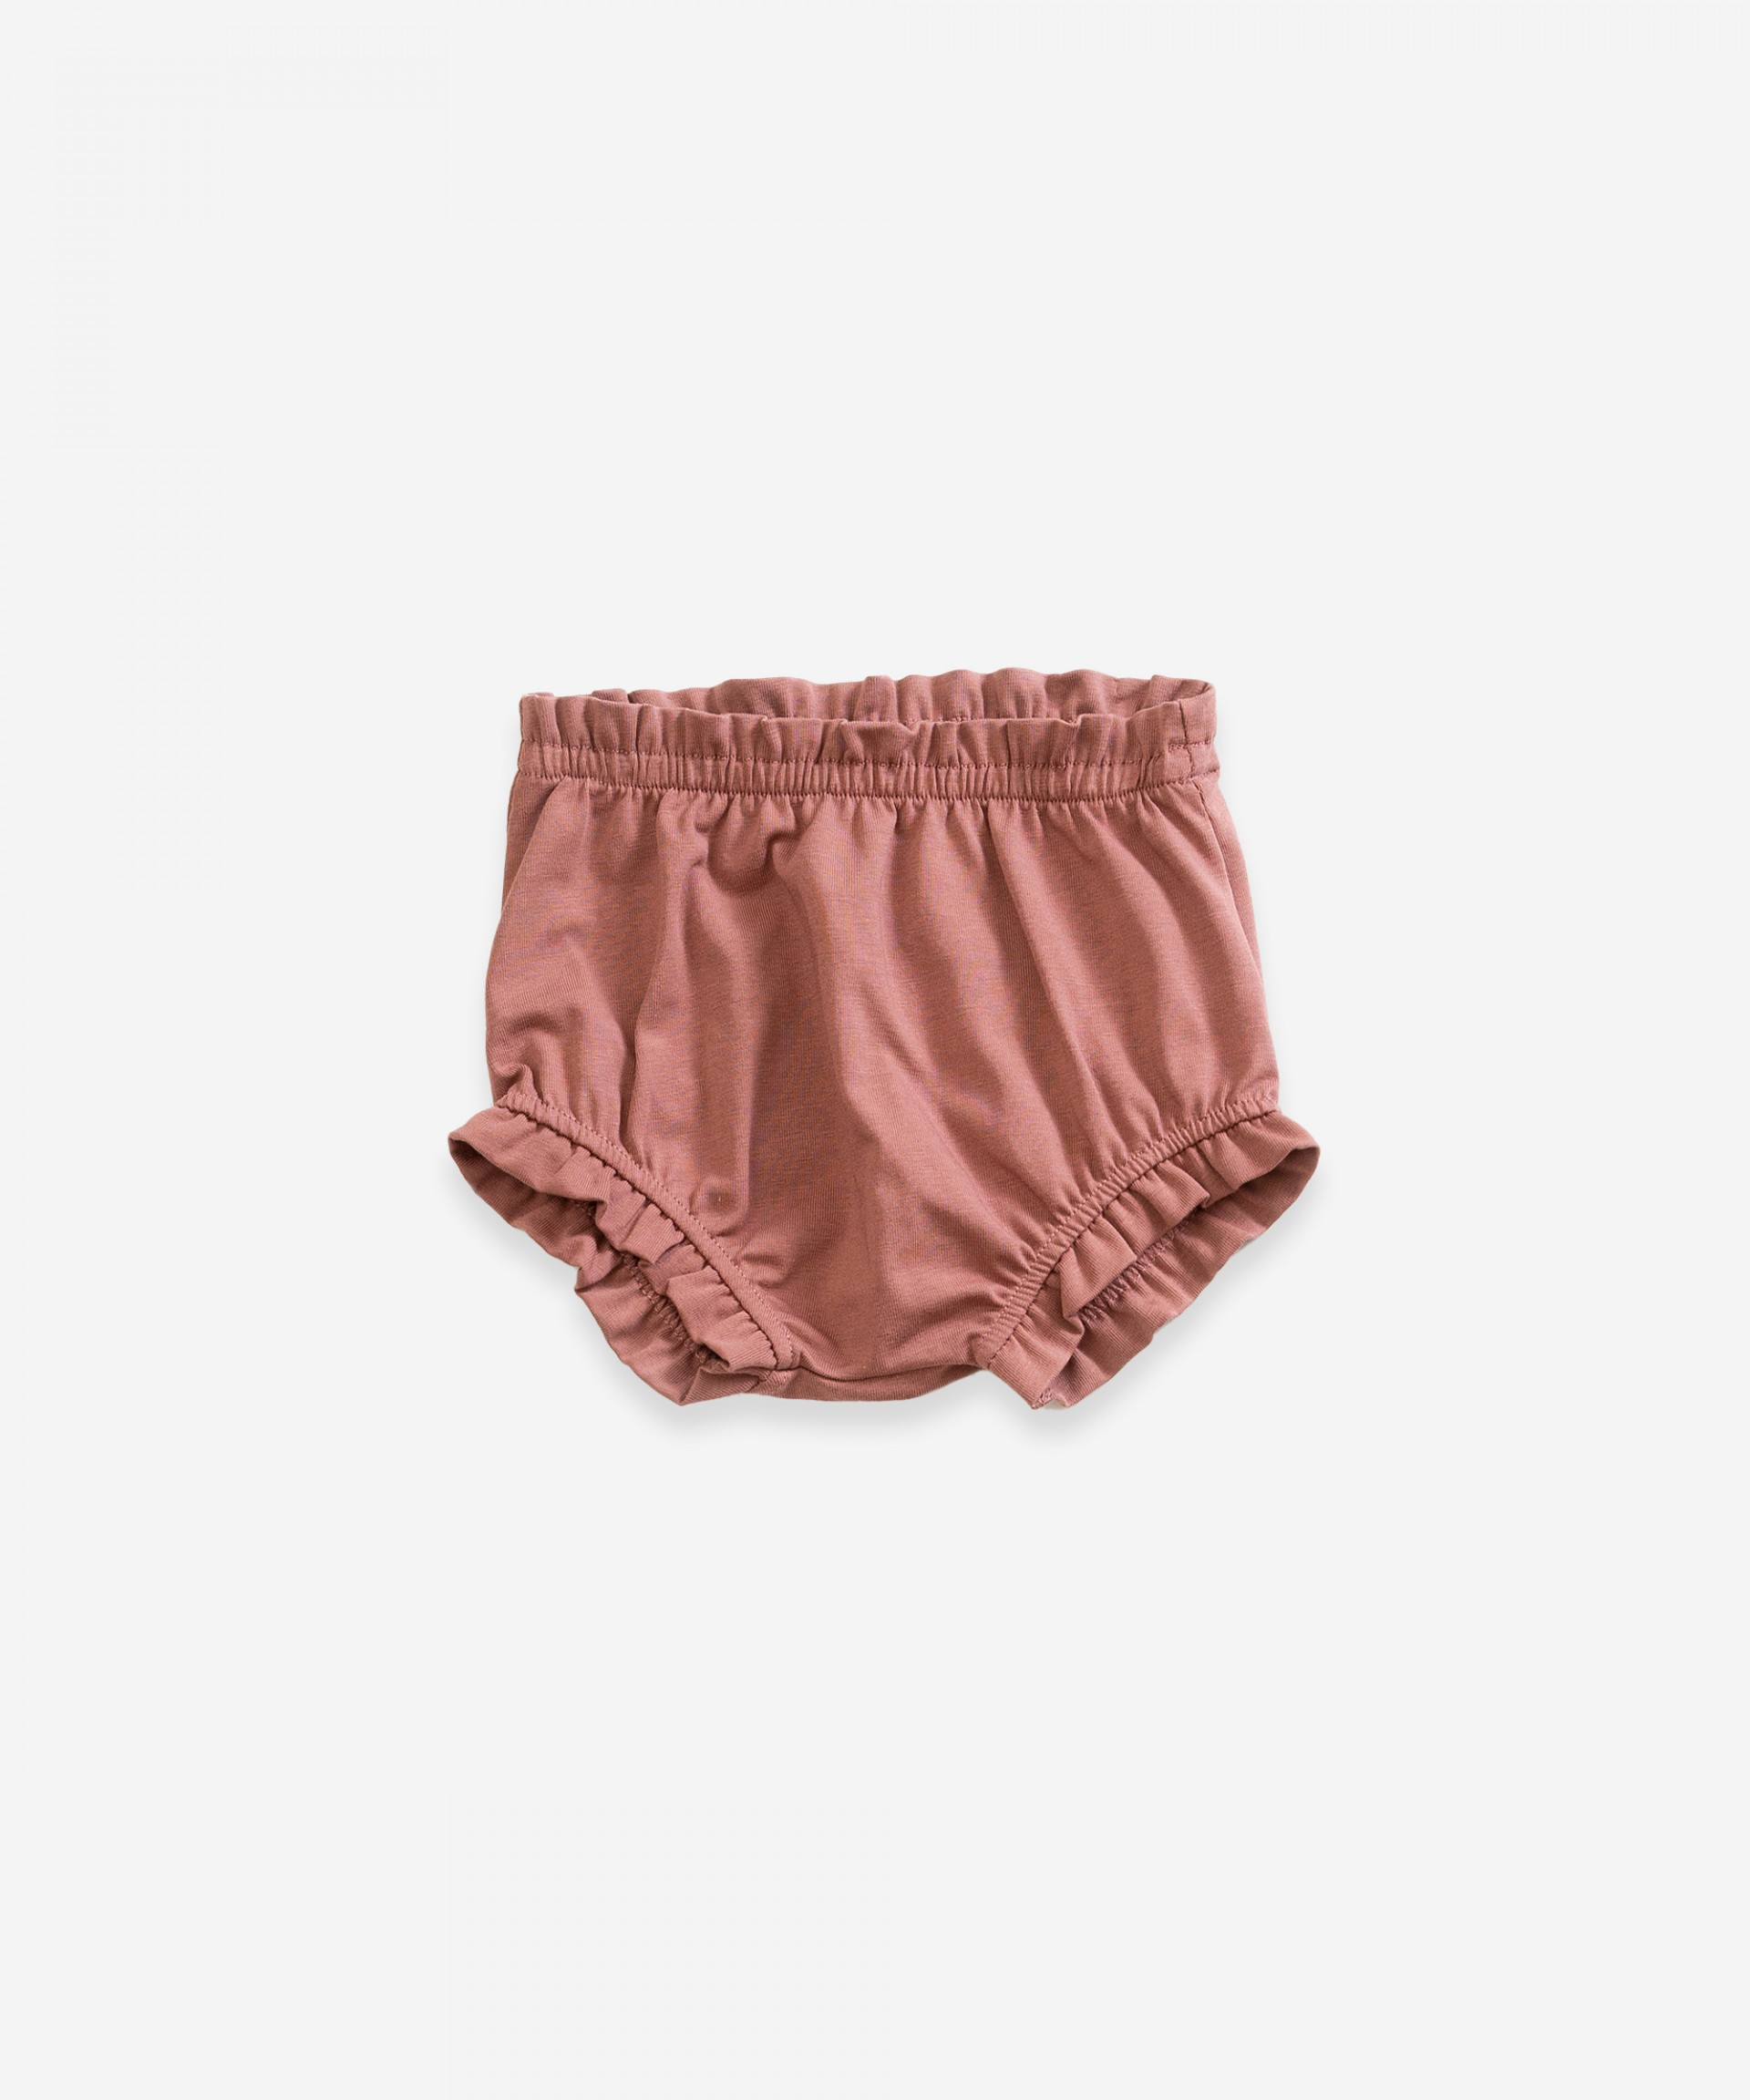 Cueca com cintura elástica | Weaving